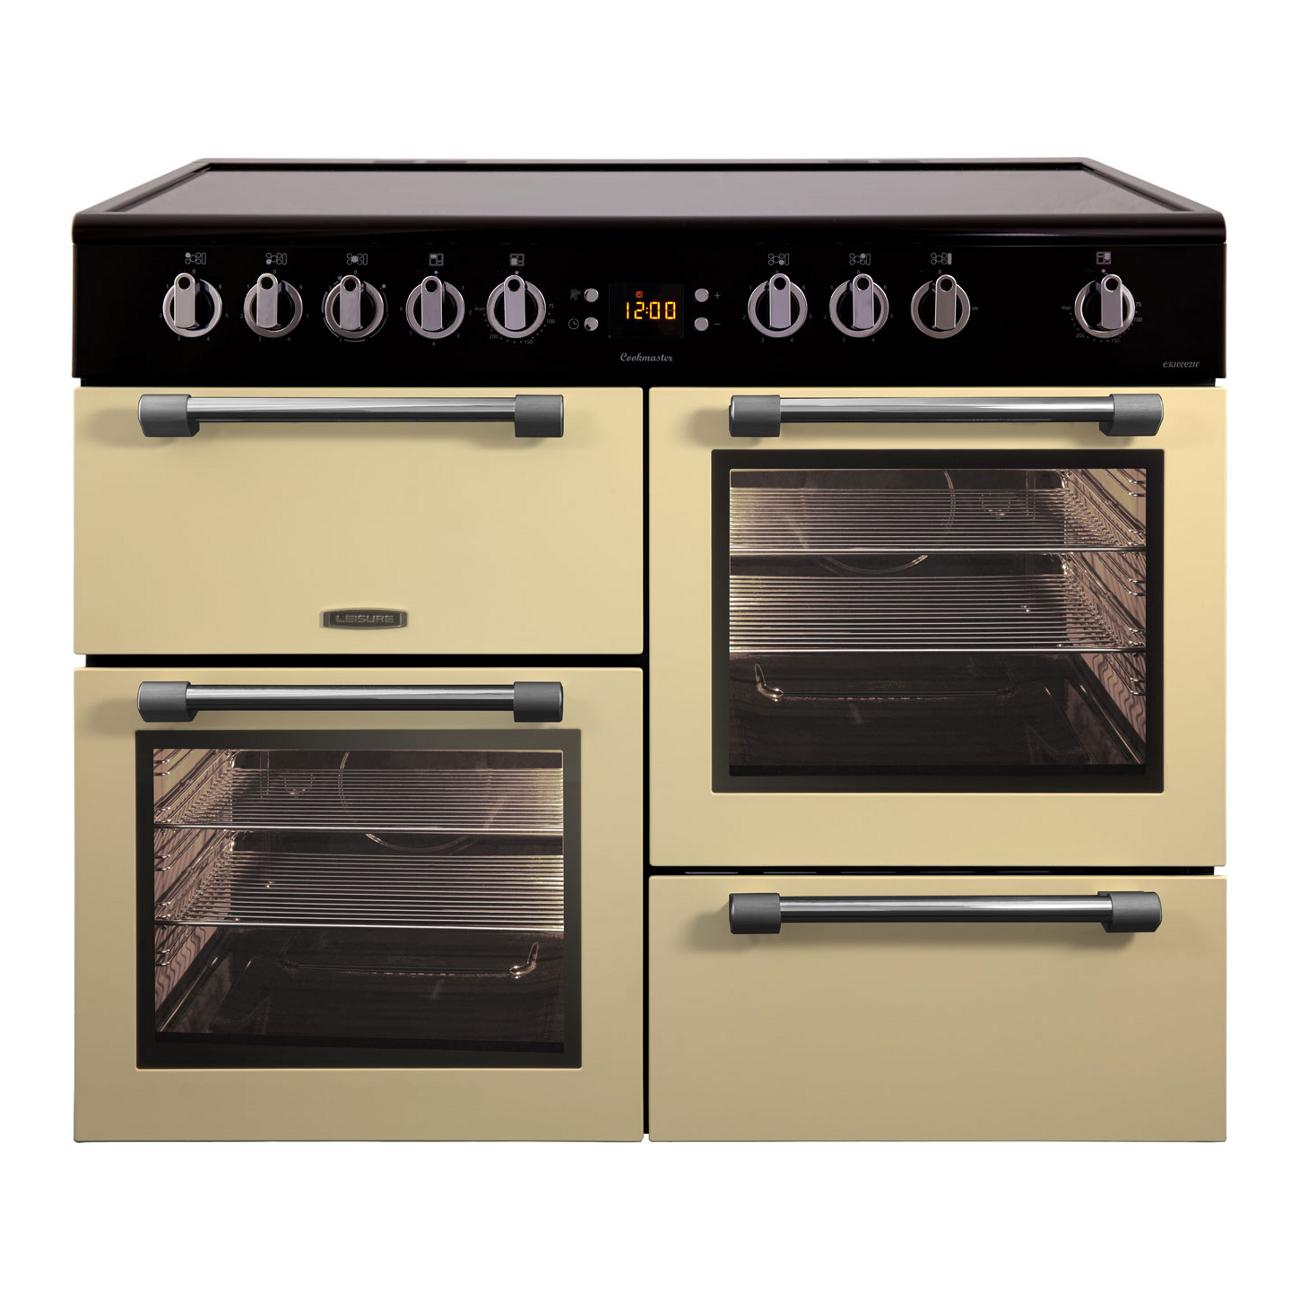 Leisure Ck100c210c Electric Double Oven Range Cooker